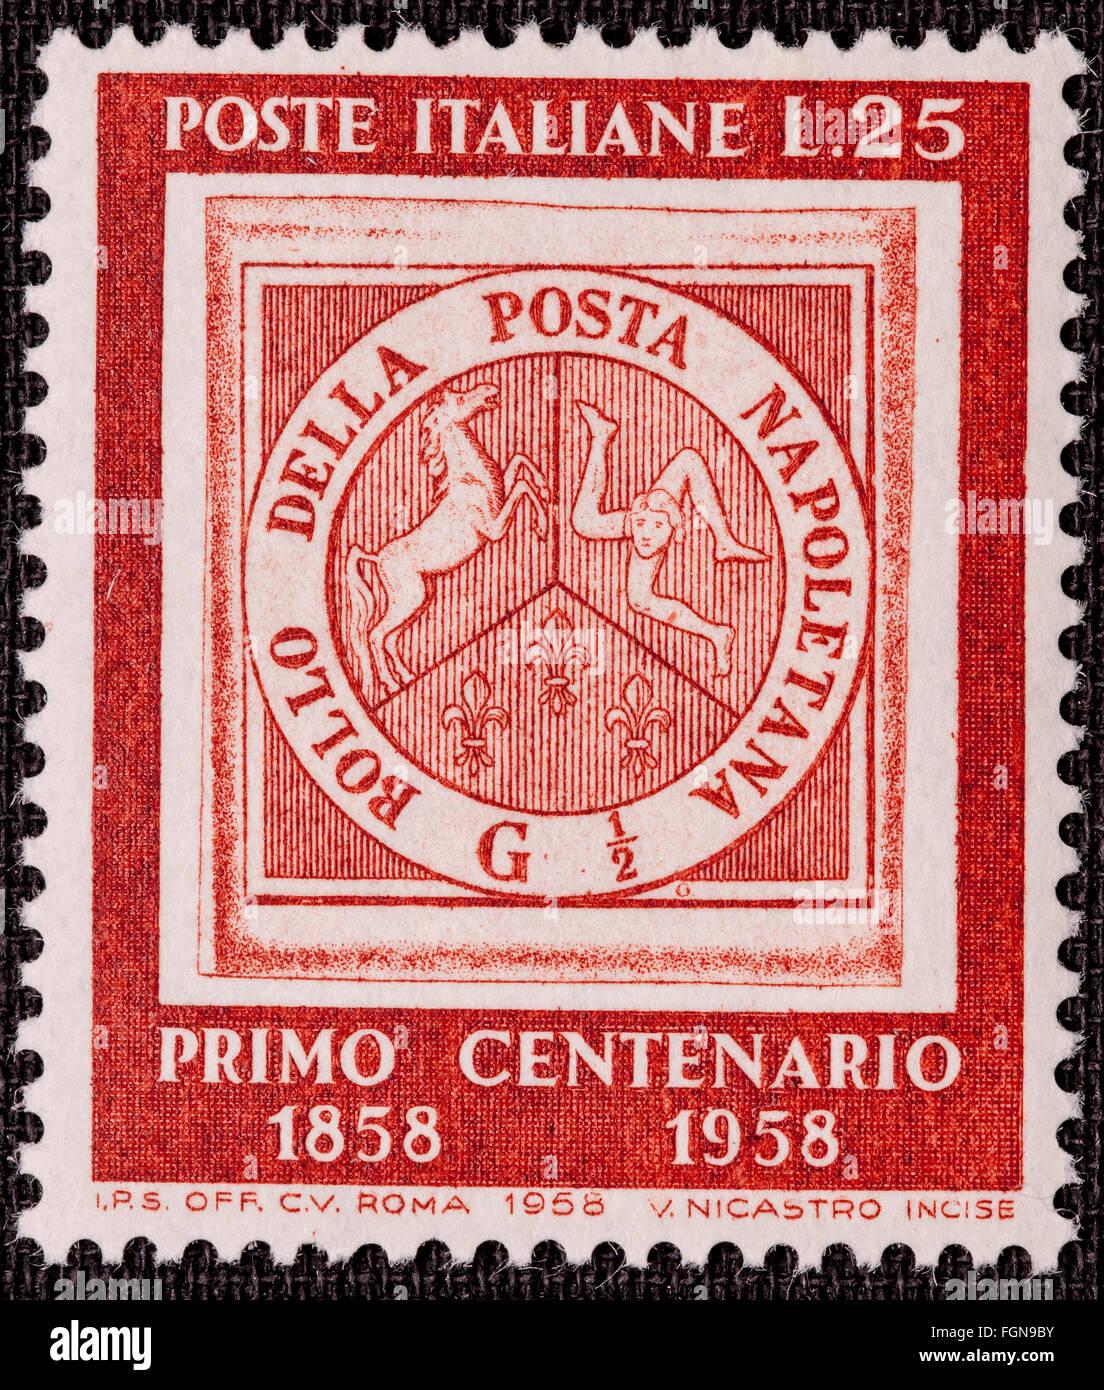 1958 Italian Mint Stamp Issued Stock Photos 1958 Italian Mint